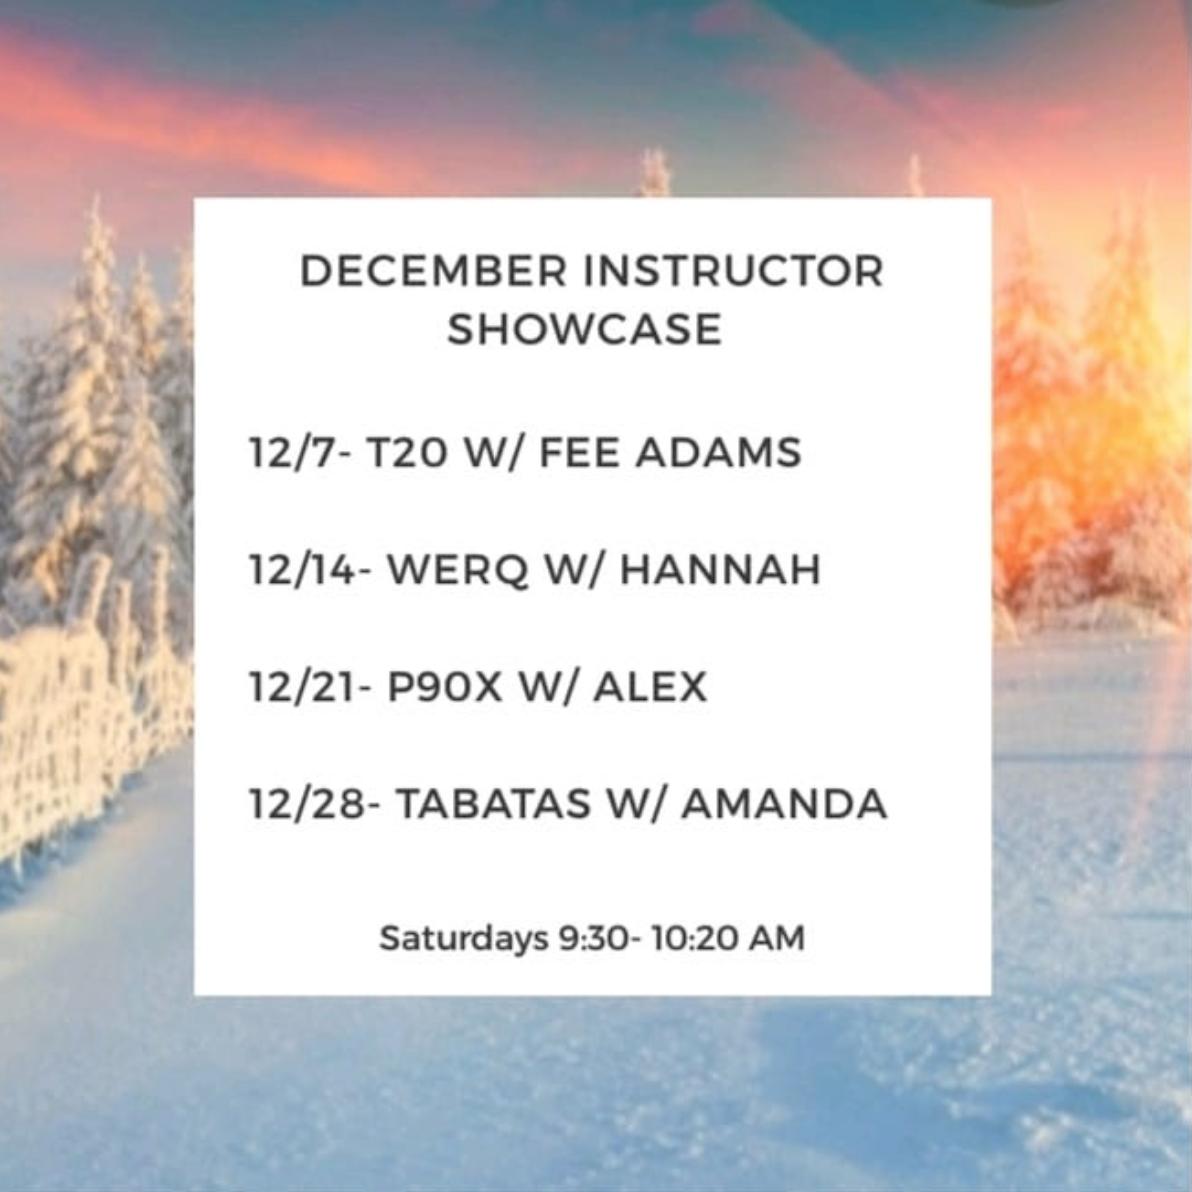 Instructor Showcase for December